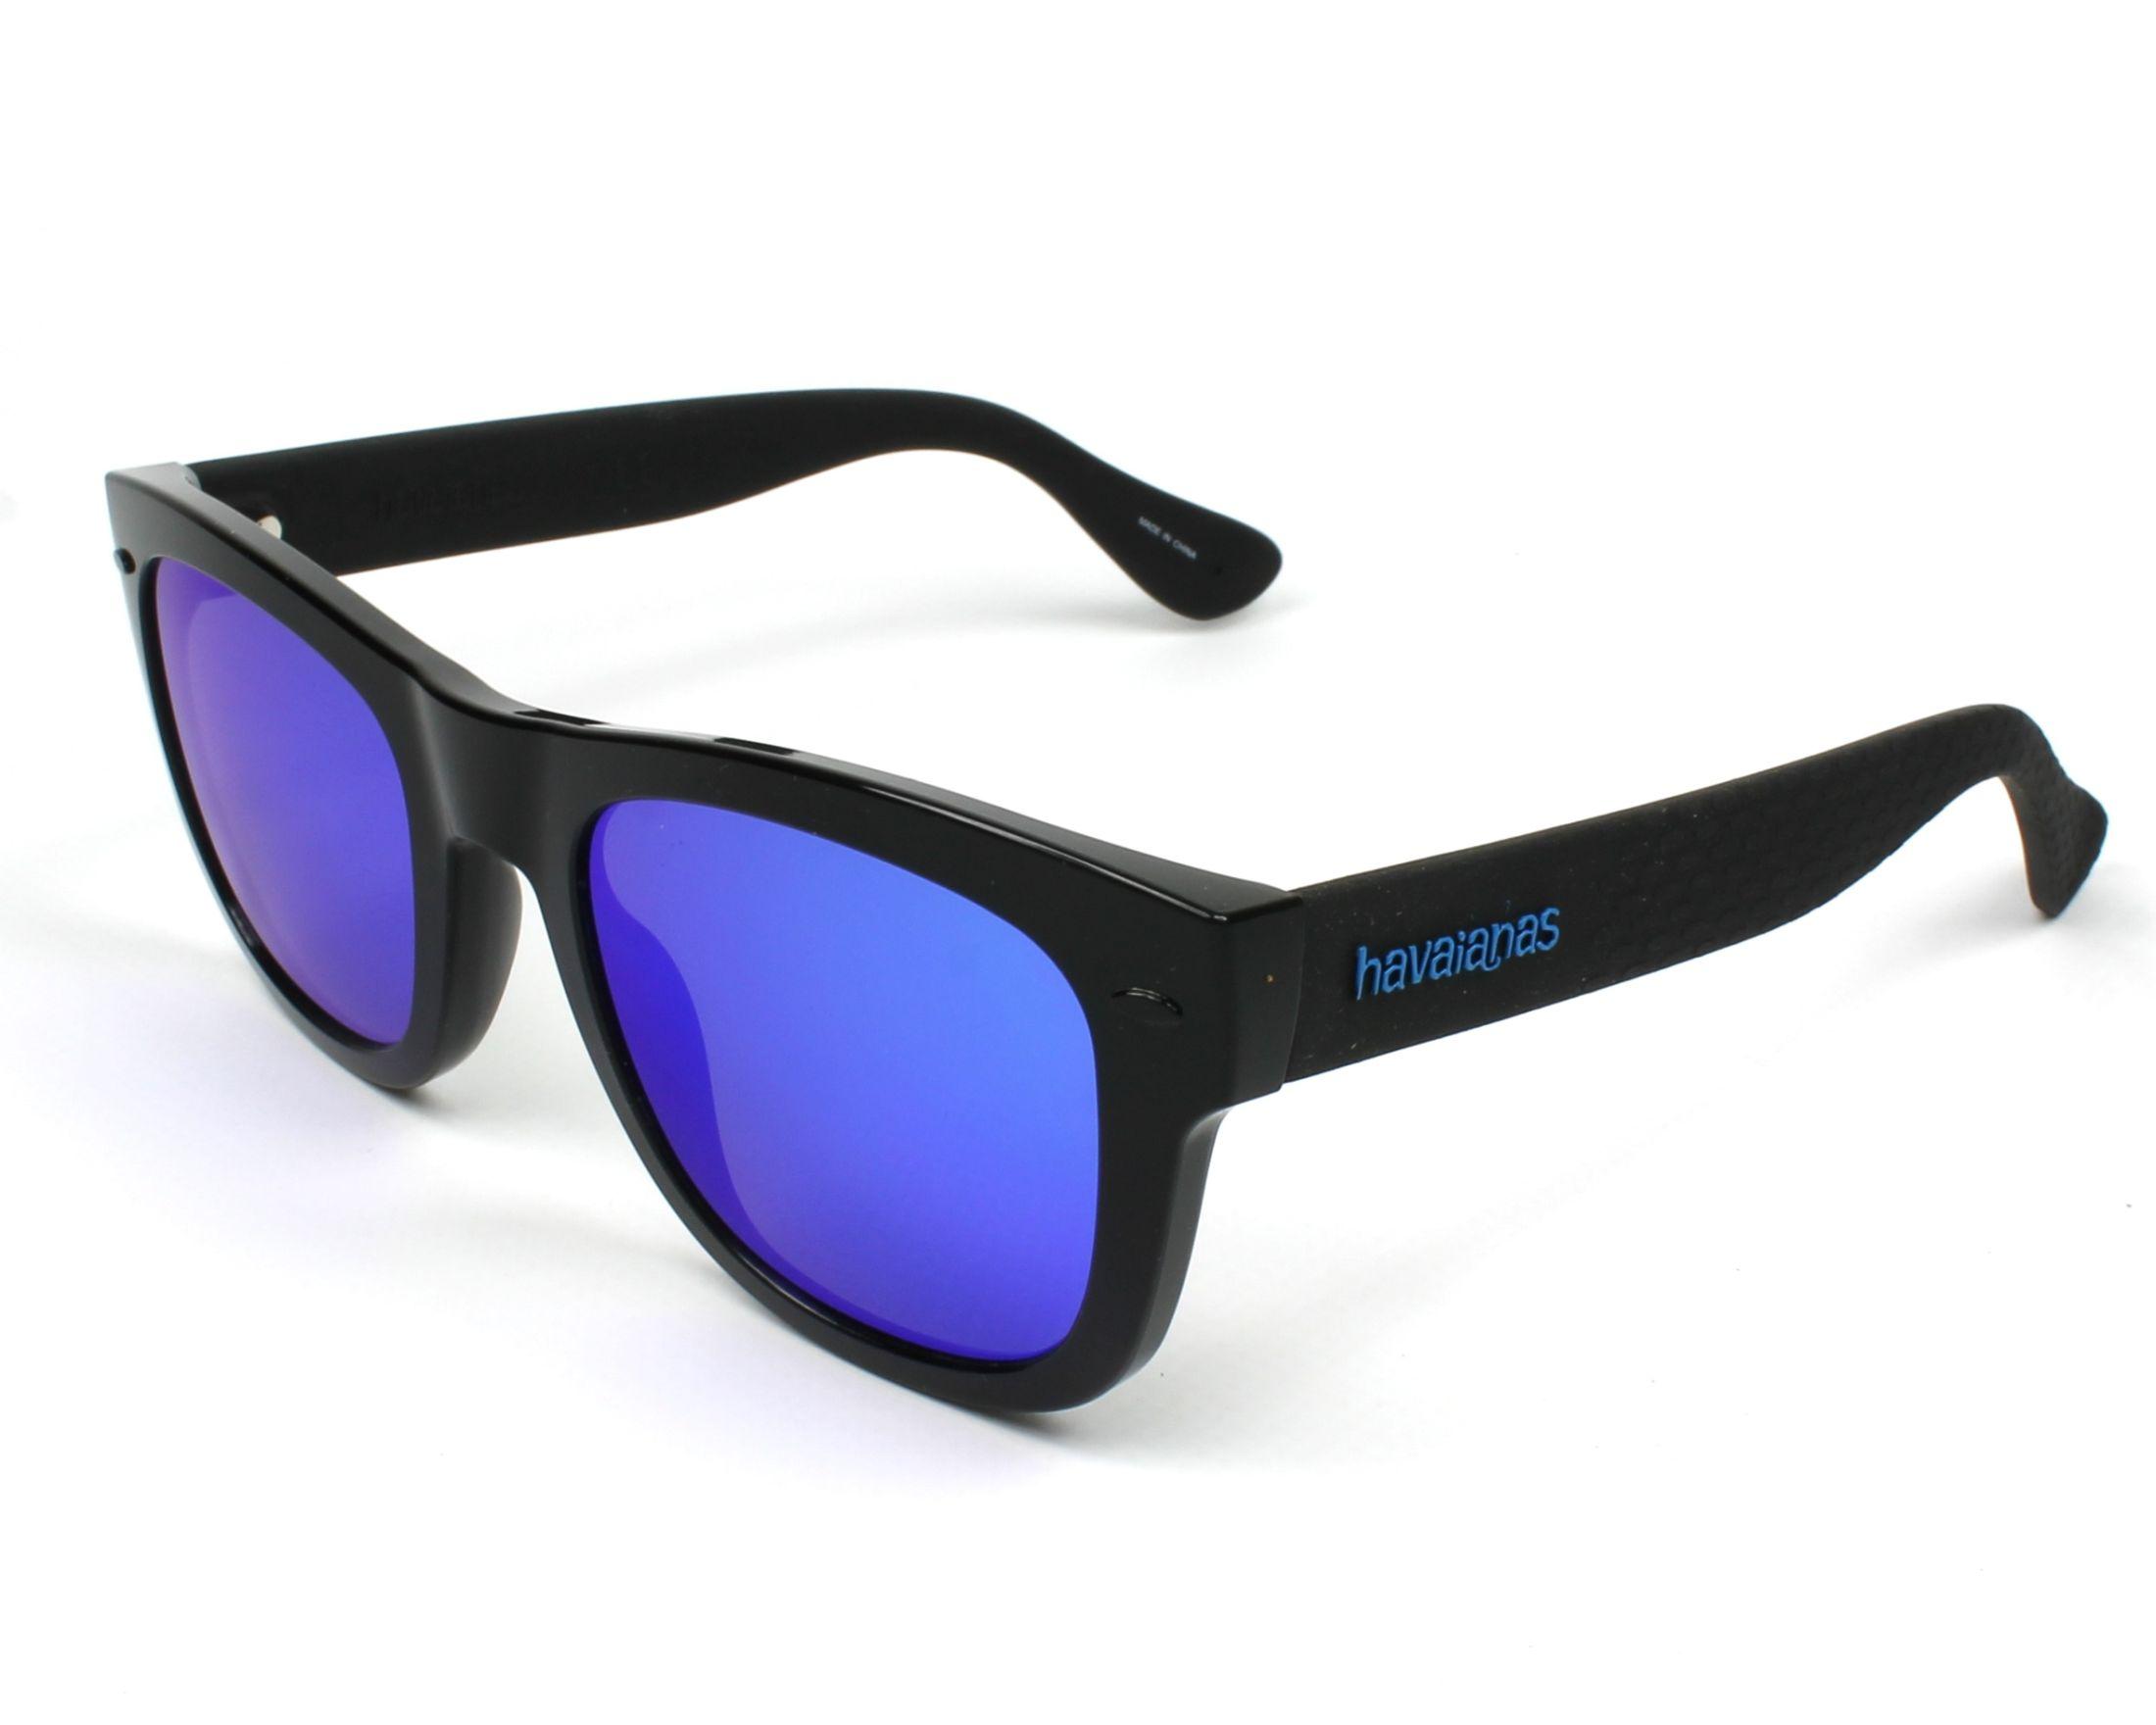 d1378f261f140 Sunglasses Havaianas PARATY-L QFU Z0 52-22 Black Black profile view